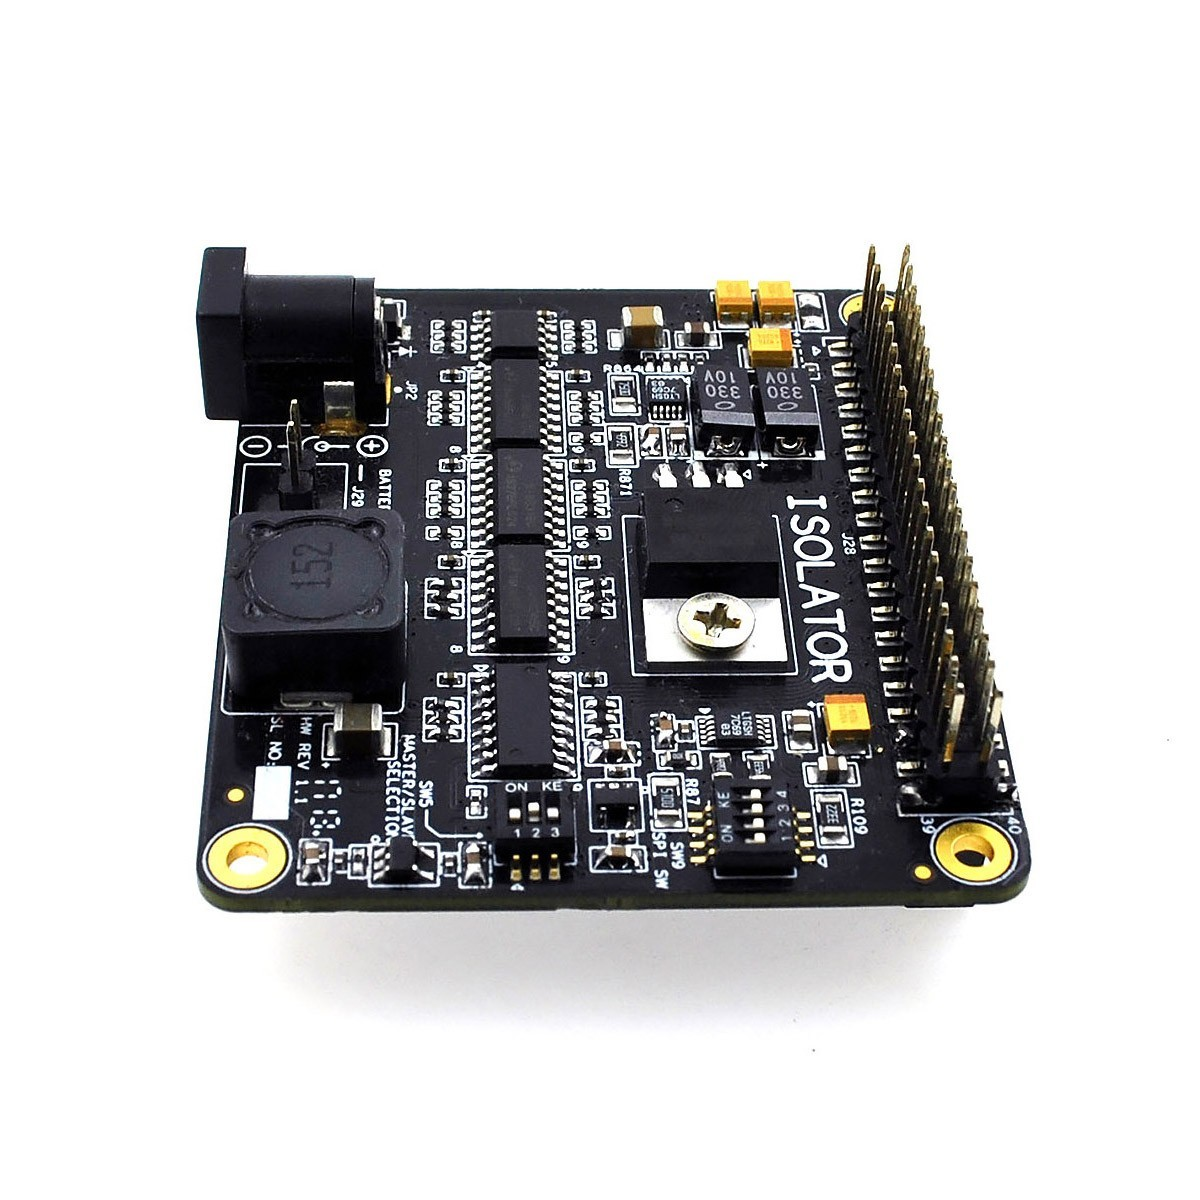 ALLO ISOLATOR Isolateur Galvanique I2S GPIO pour Sparky / Raspberry PI